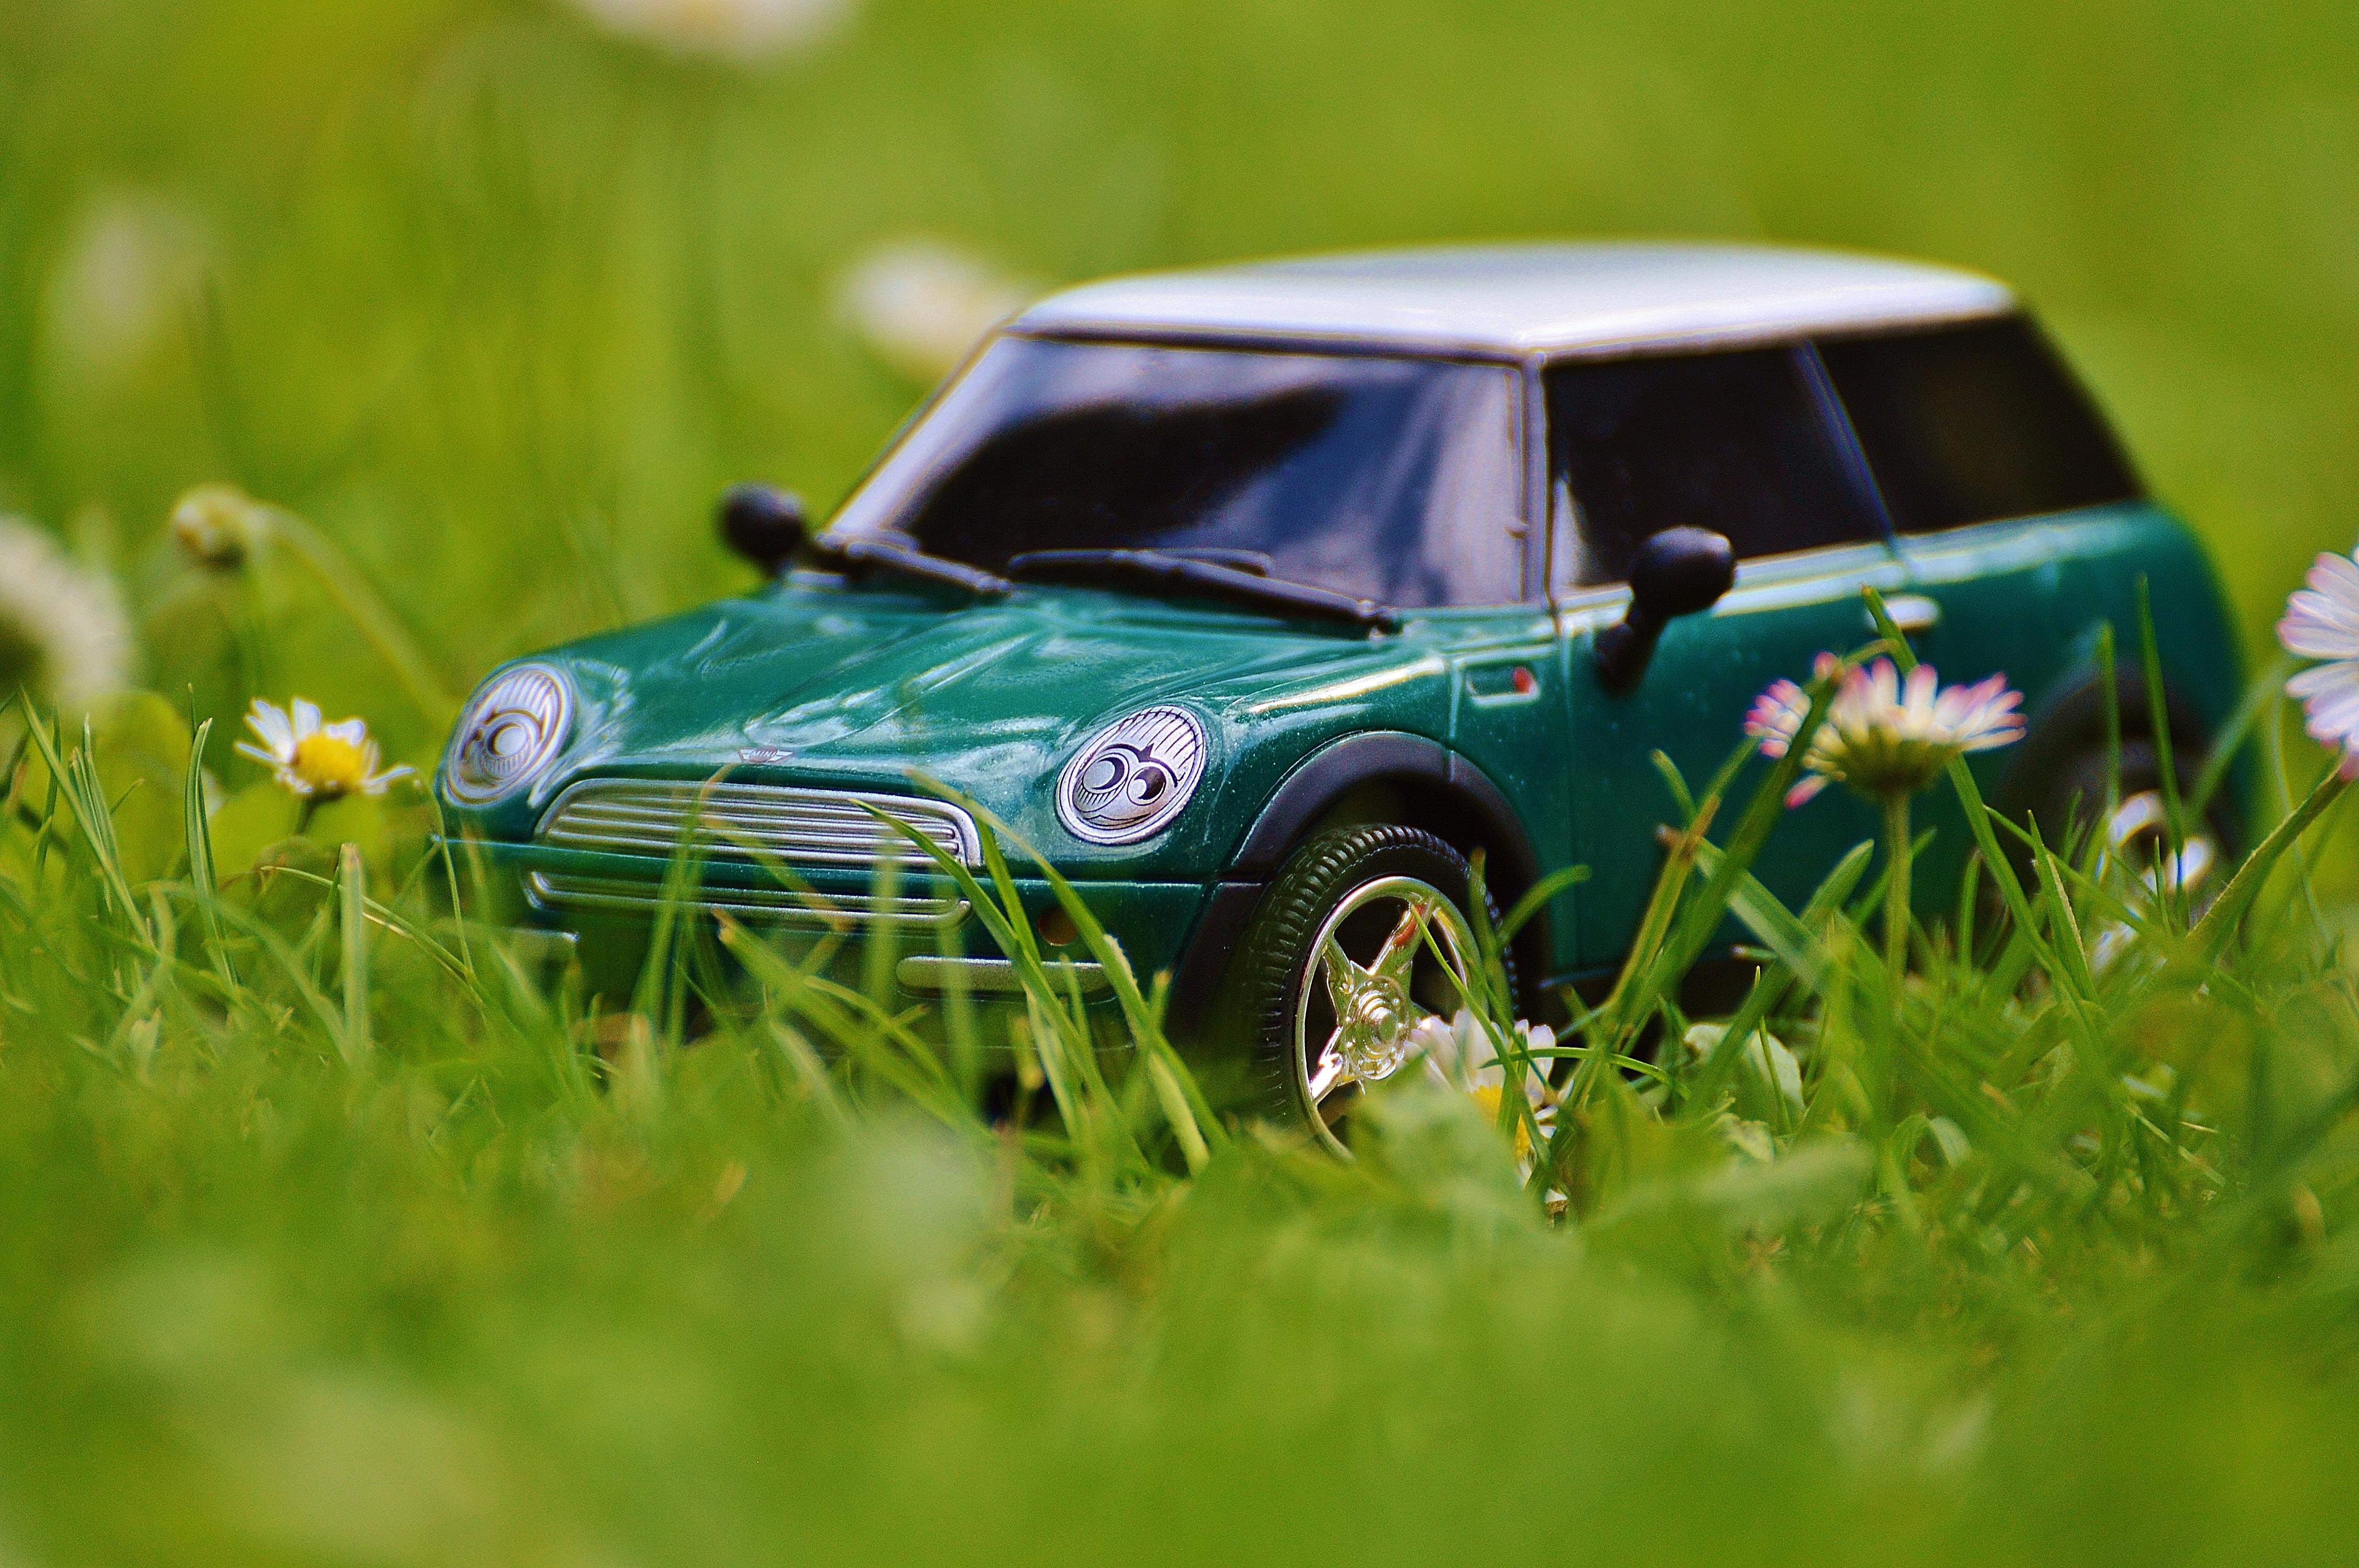 Car Model Green Vehicle Auto Mini Cooper Land Automobile Make Automotive Exterior Design